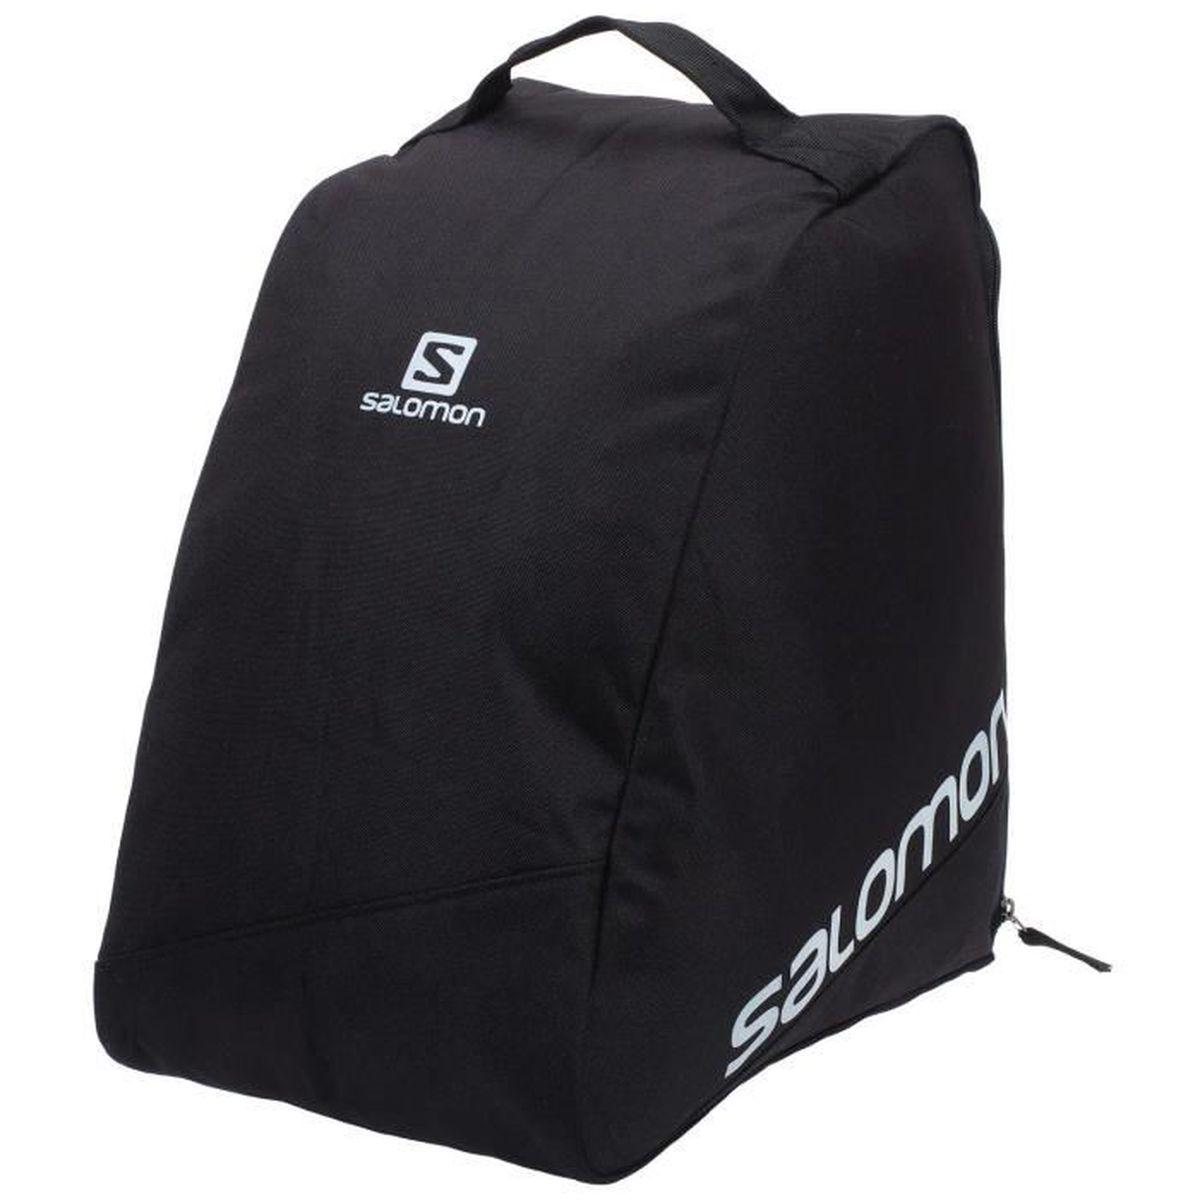 De Sac Ski Bootbag Black Noir Salomon Uni Chaussures Original doerxBC